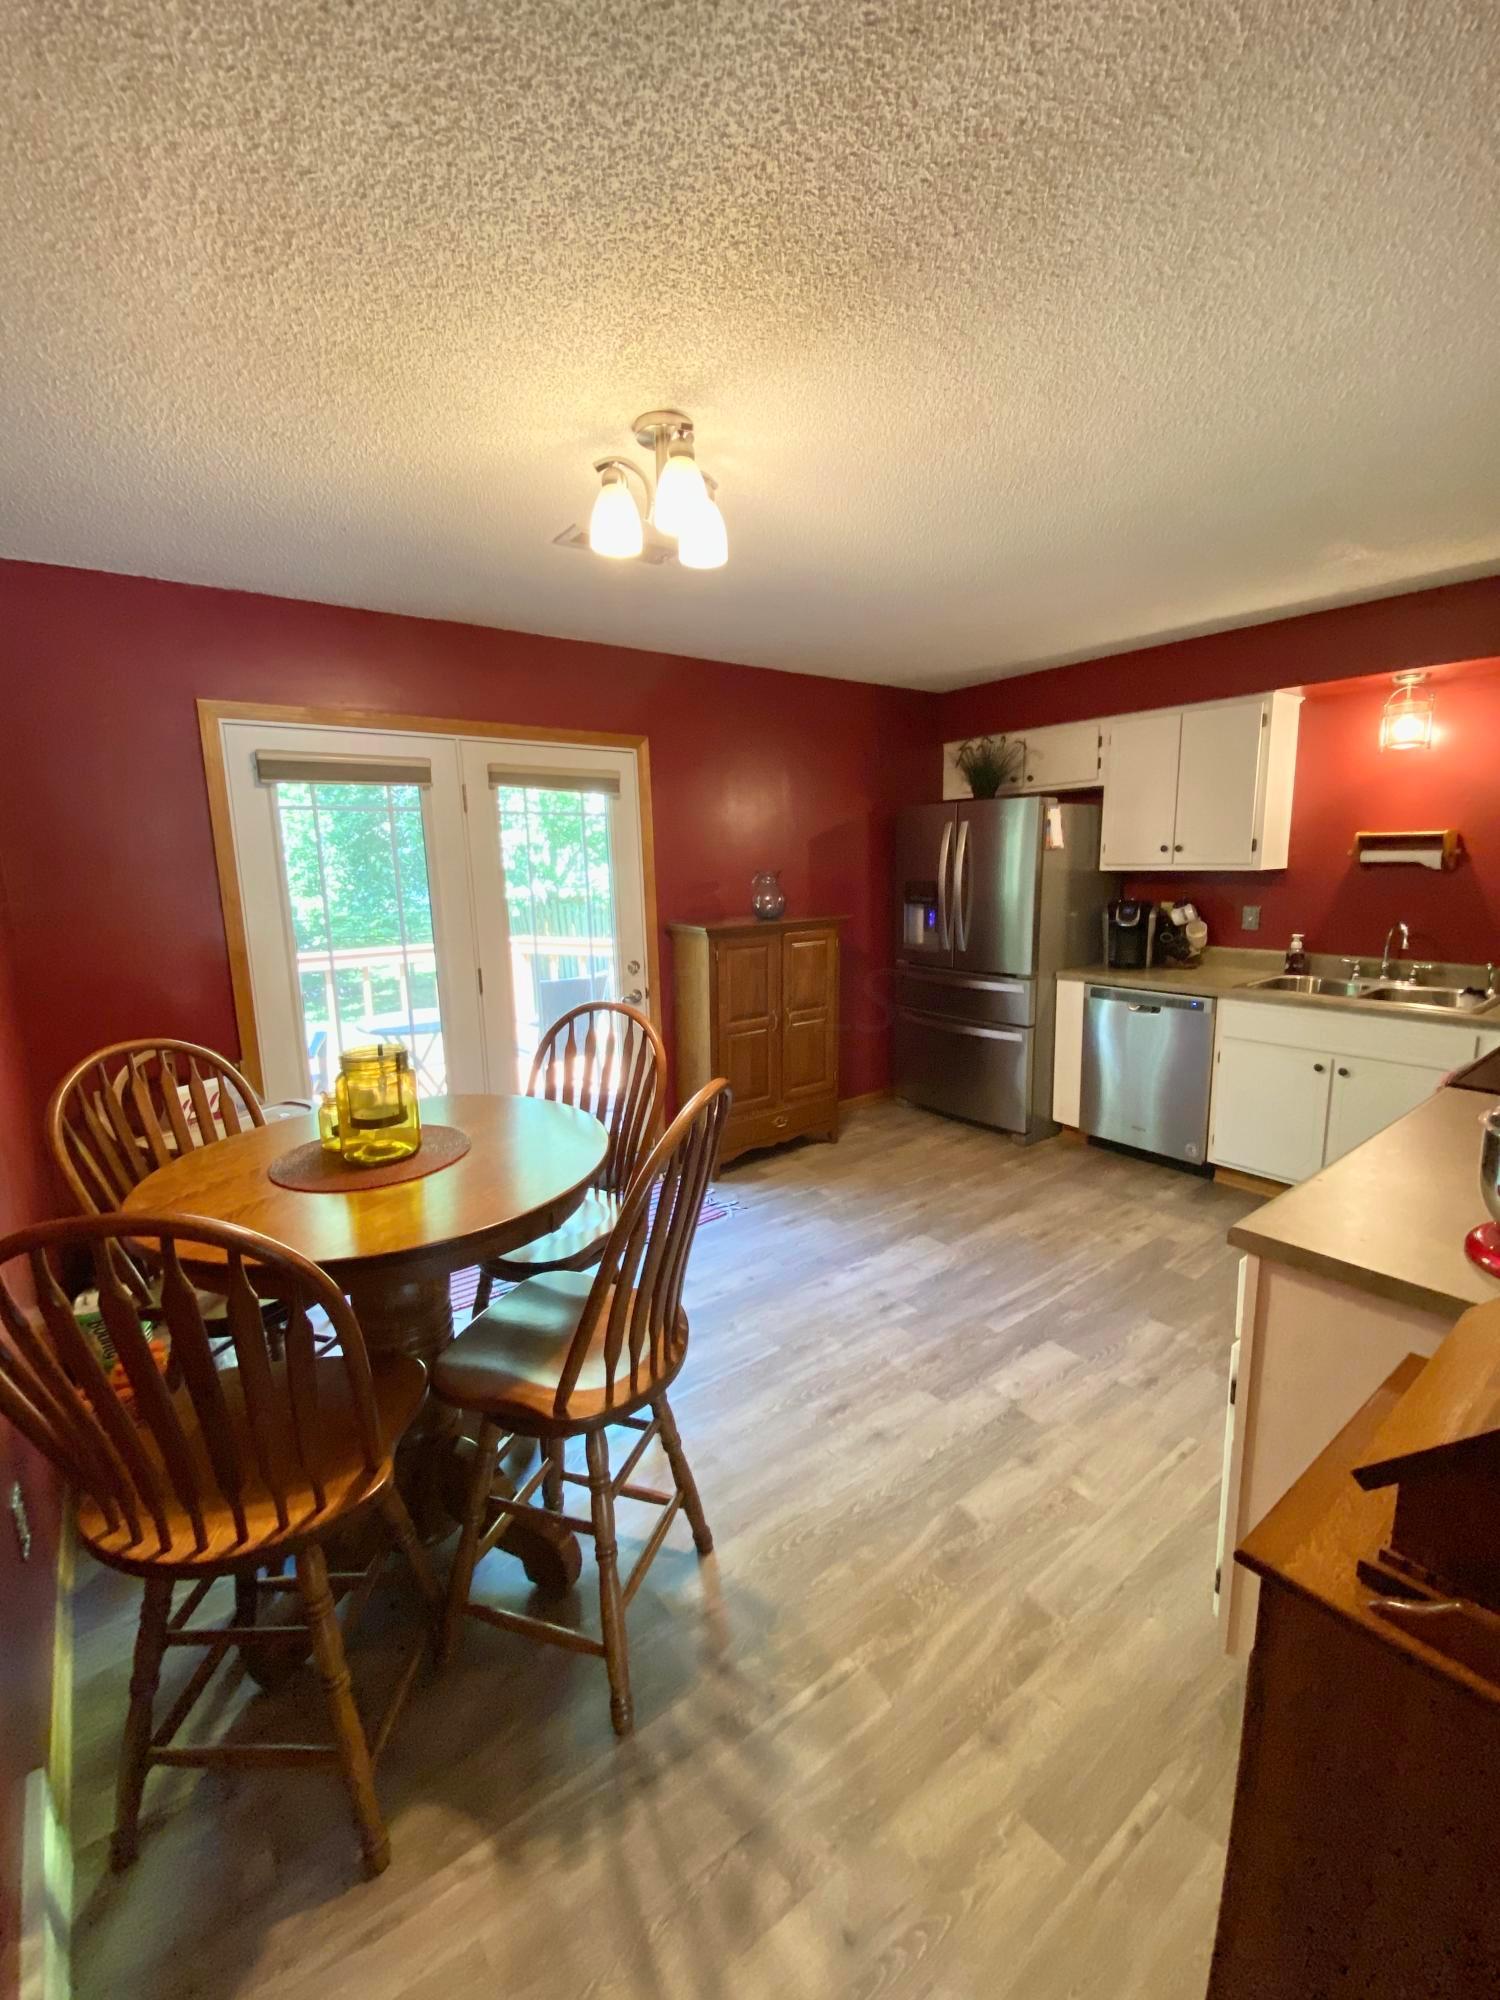 5991 Meadowsglen Drive, Dublin, Ohio 43017, 3 Bedrooms Bedrooms, ,2 BathroomsBathrooms,Residential,For Sale,Meadowsglen,220031200